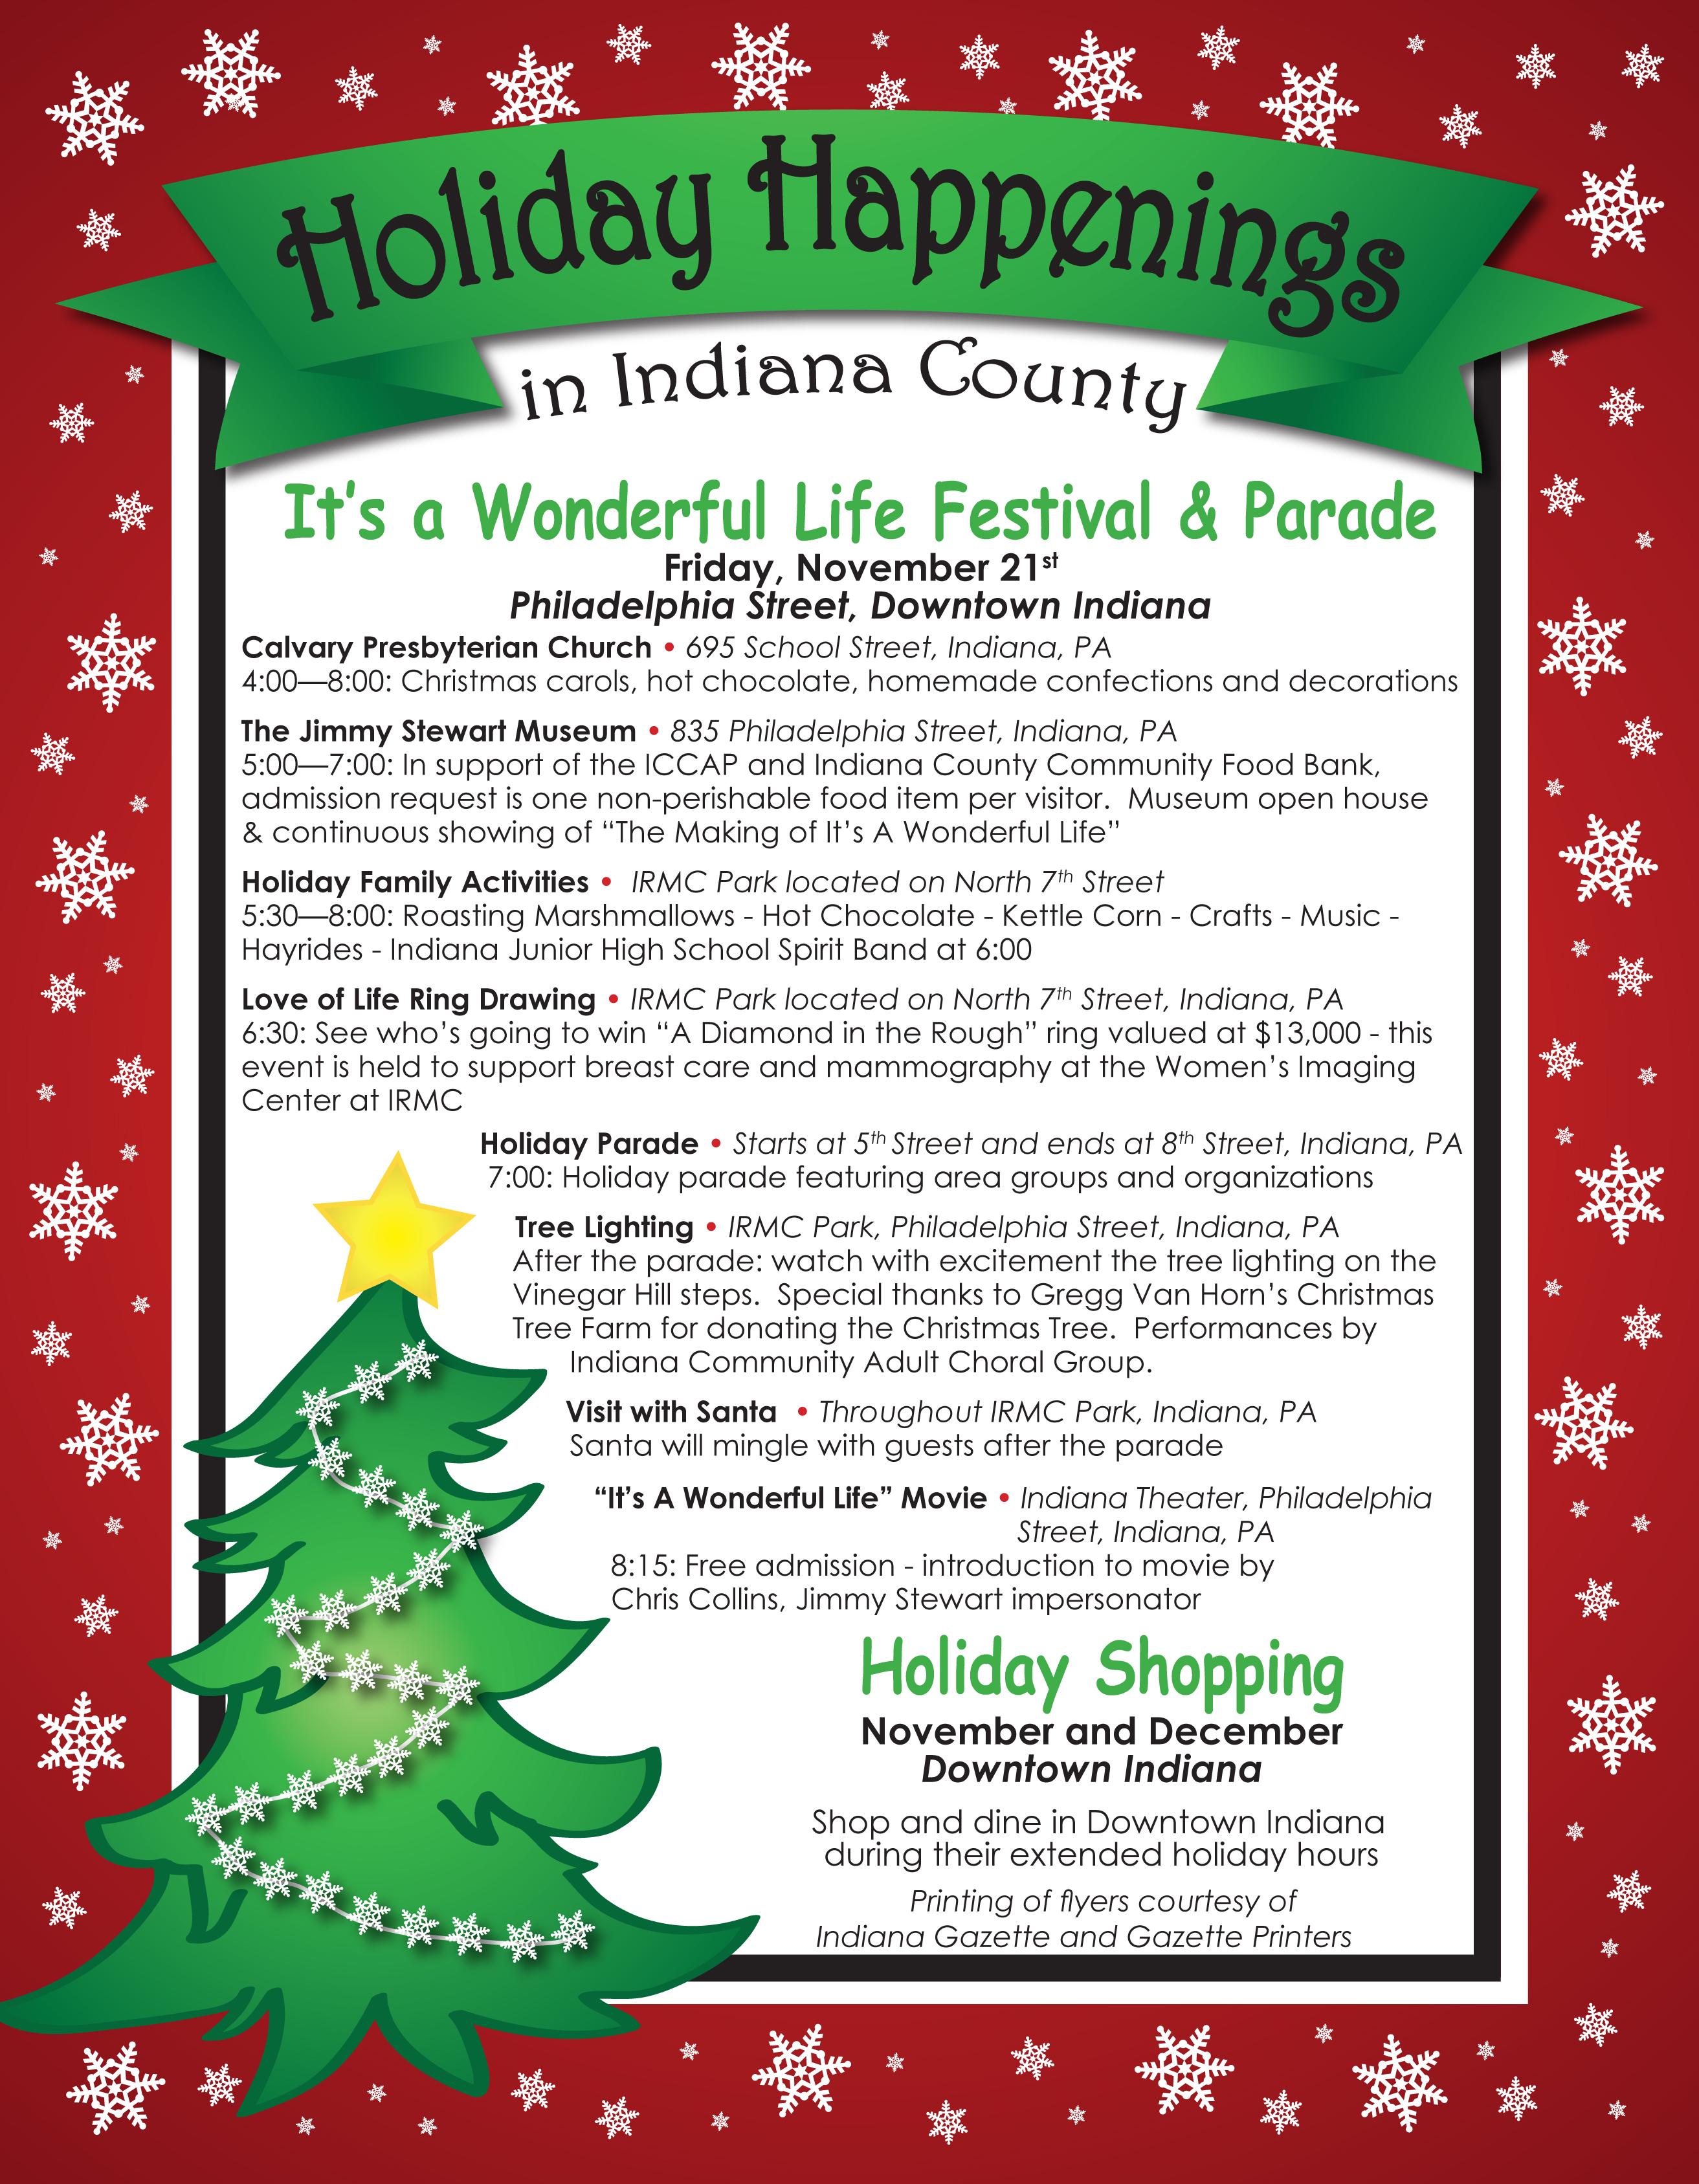 2014 Holiday Happenings — Indiana County Tourist Bureau